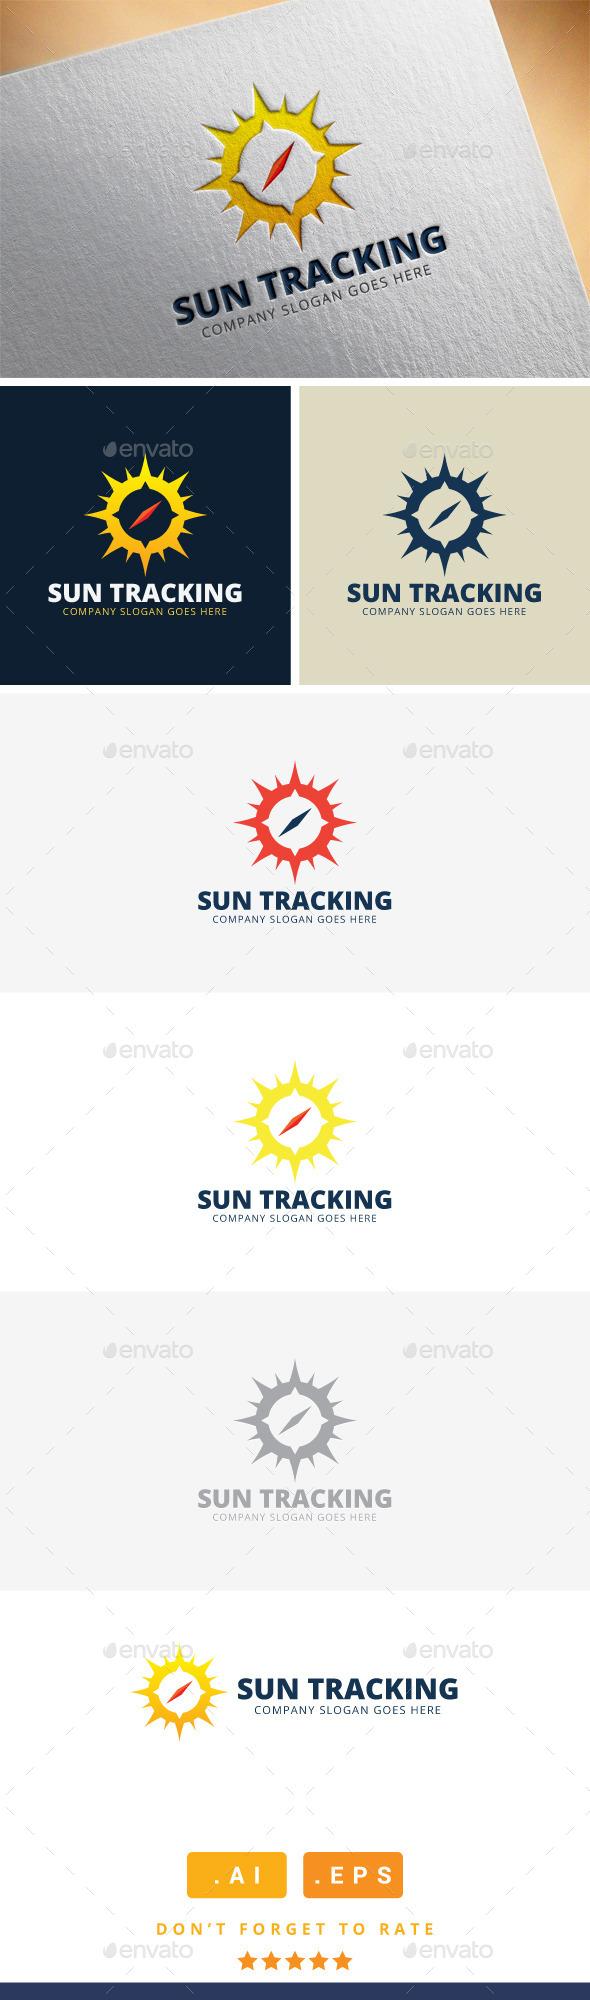 GraphicRiver Sun Tracking Logo 11409574